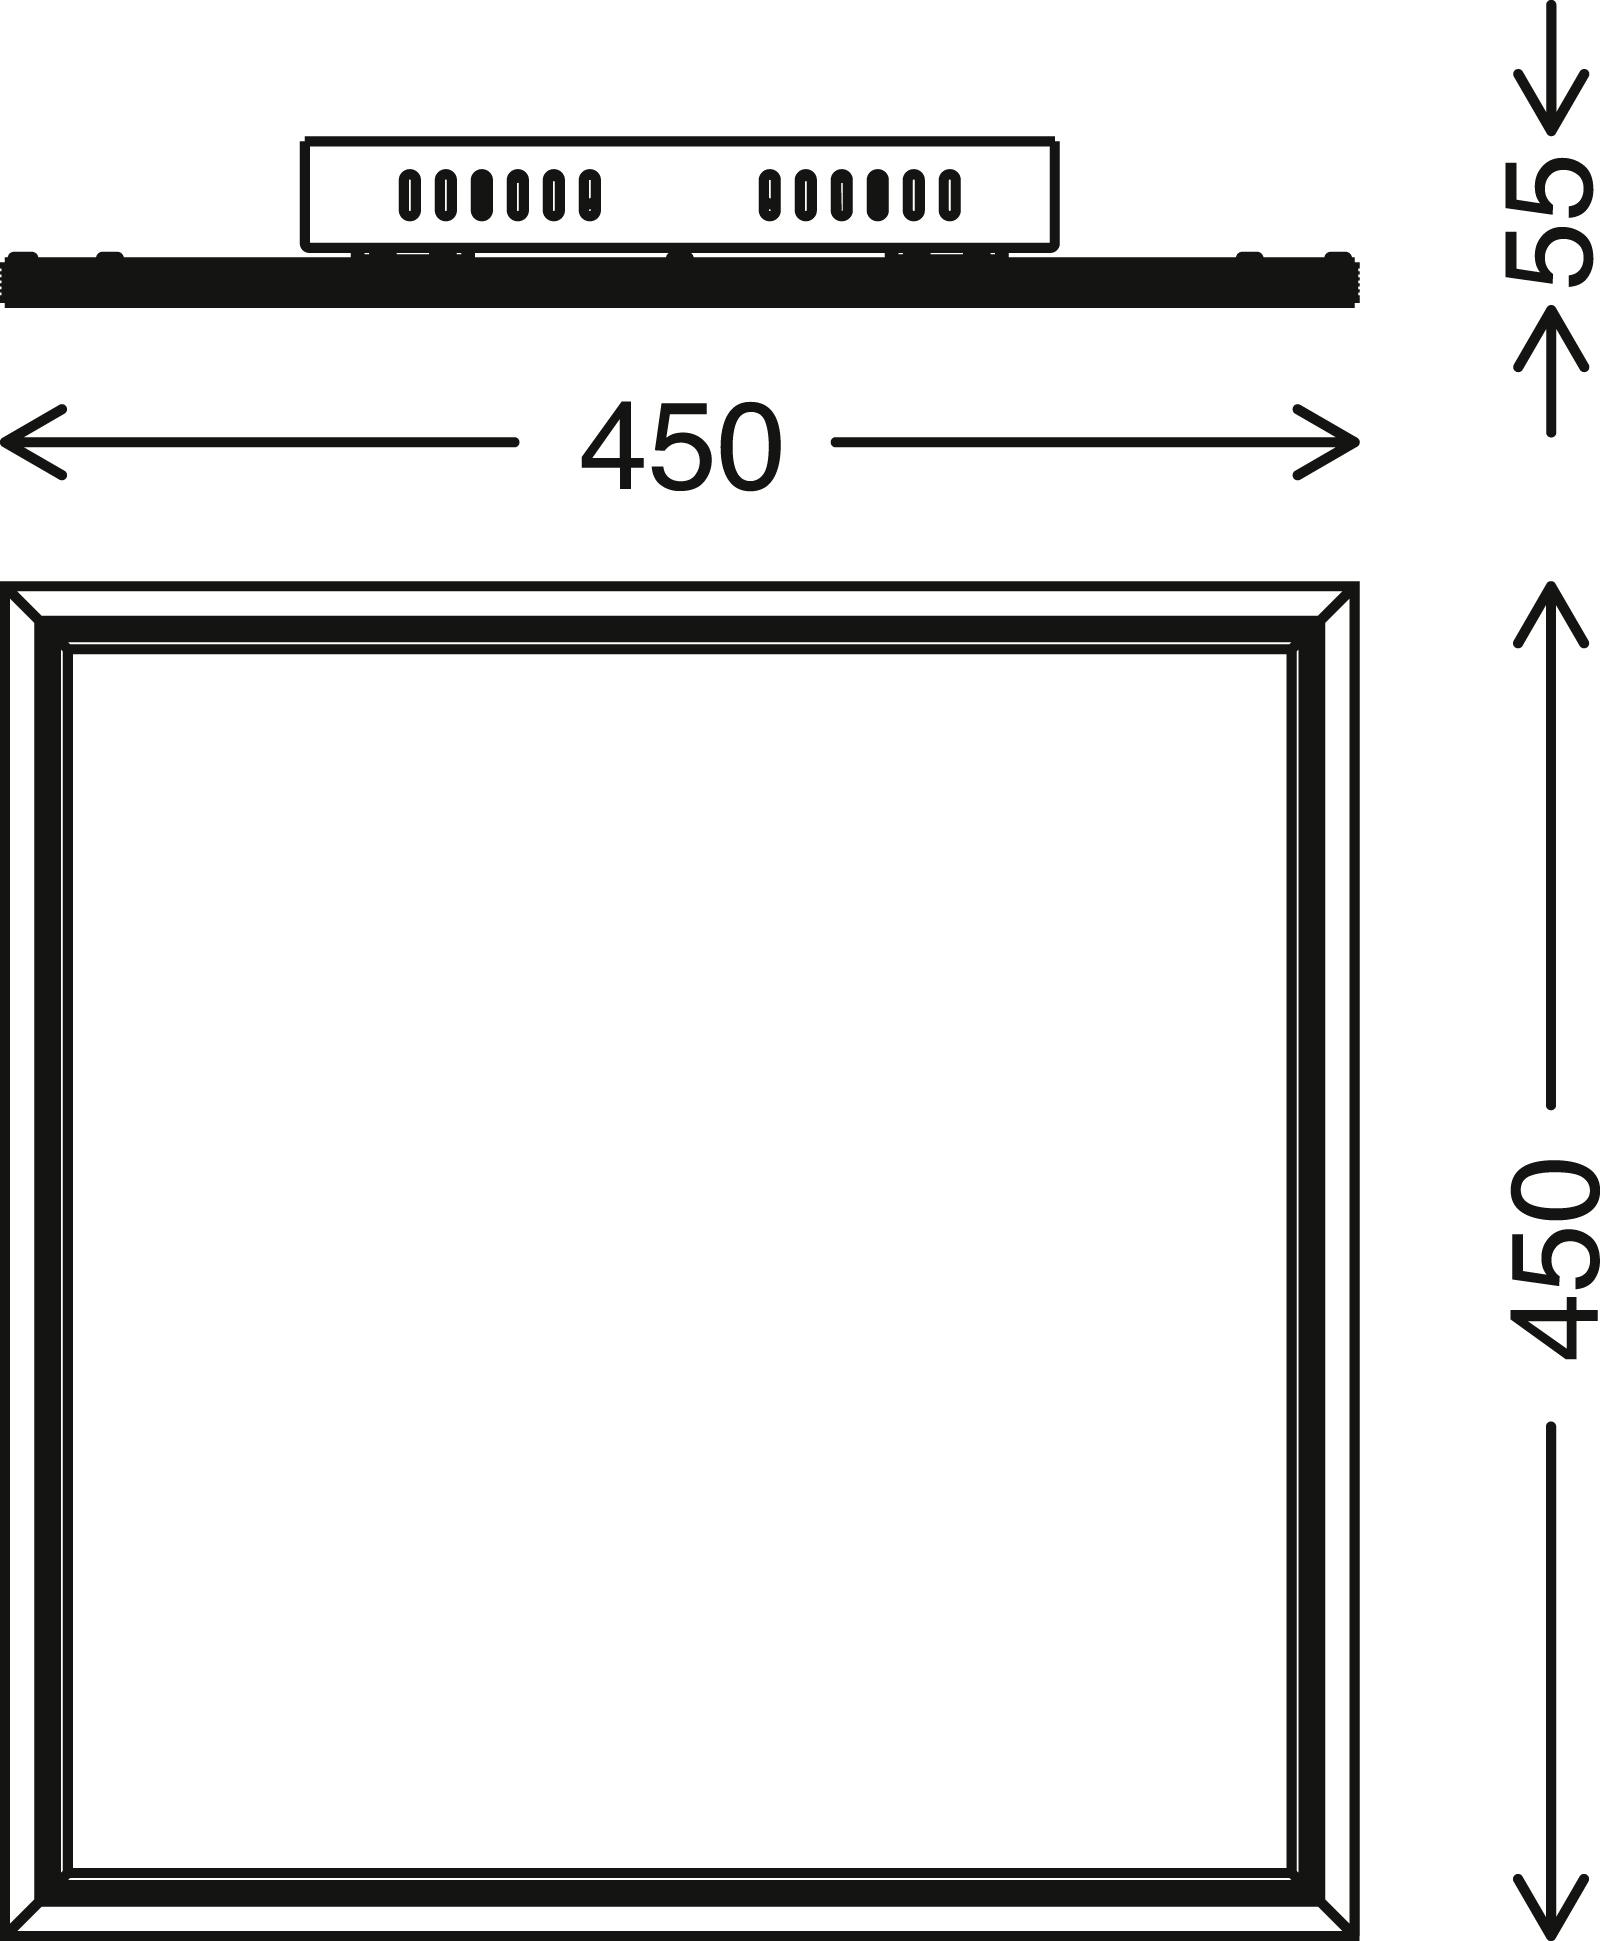 TELEFUNKEN RGB LED Panel, 45 cm, 24 W, Weiß